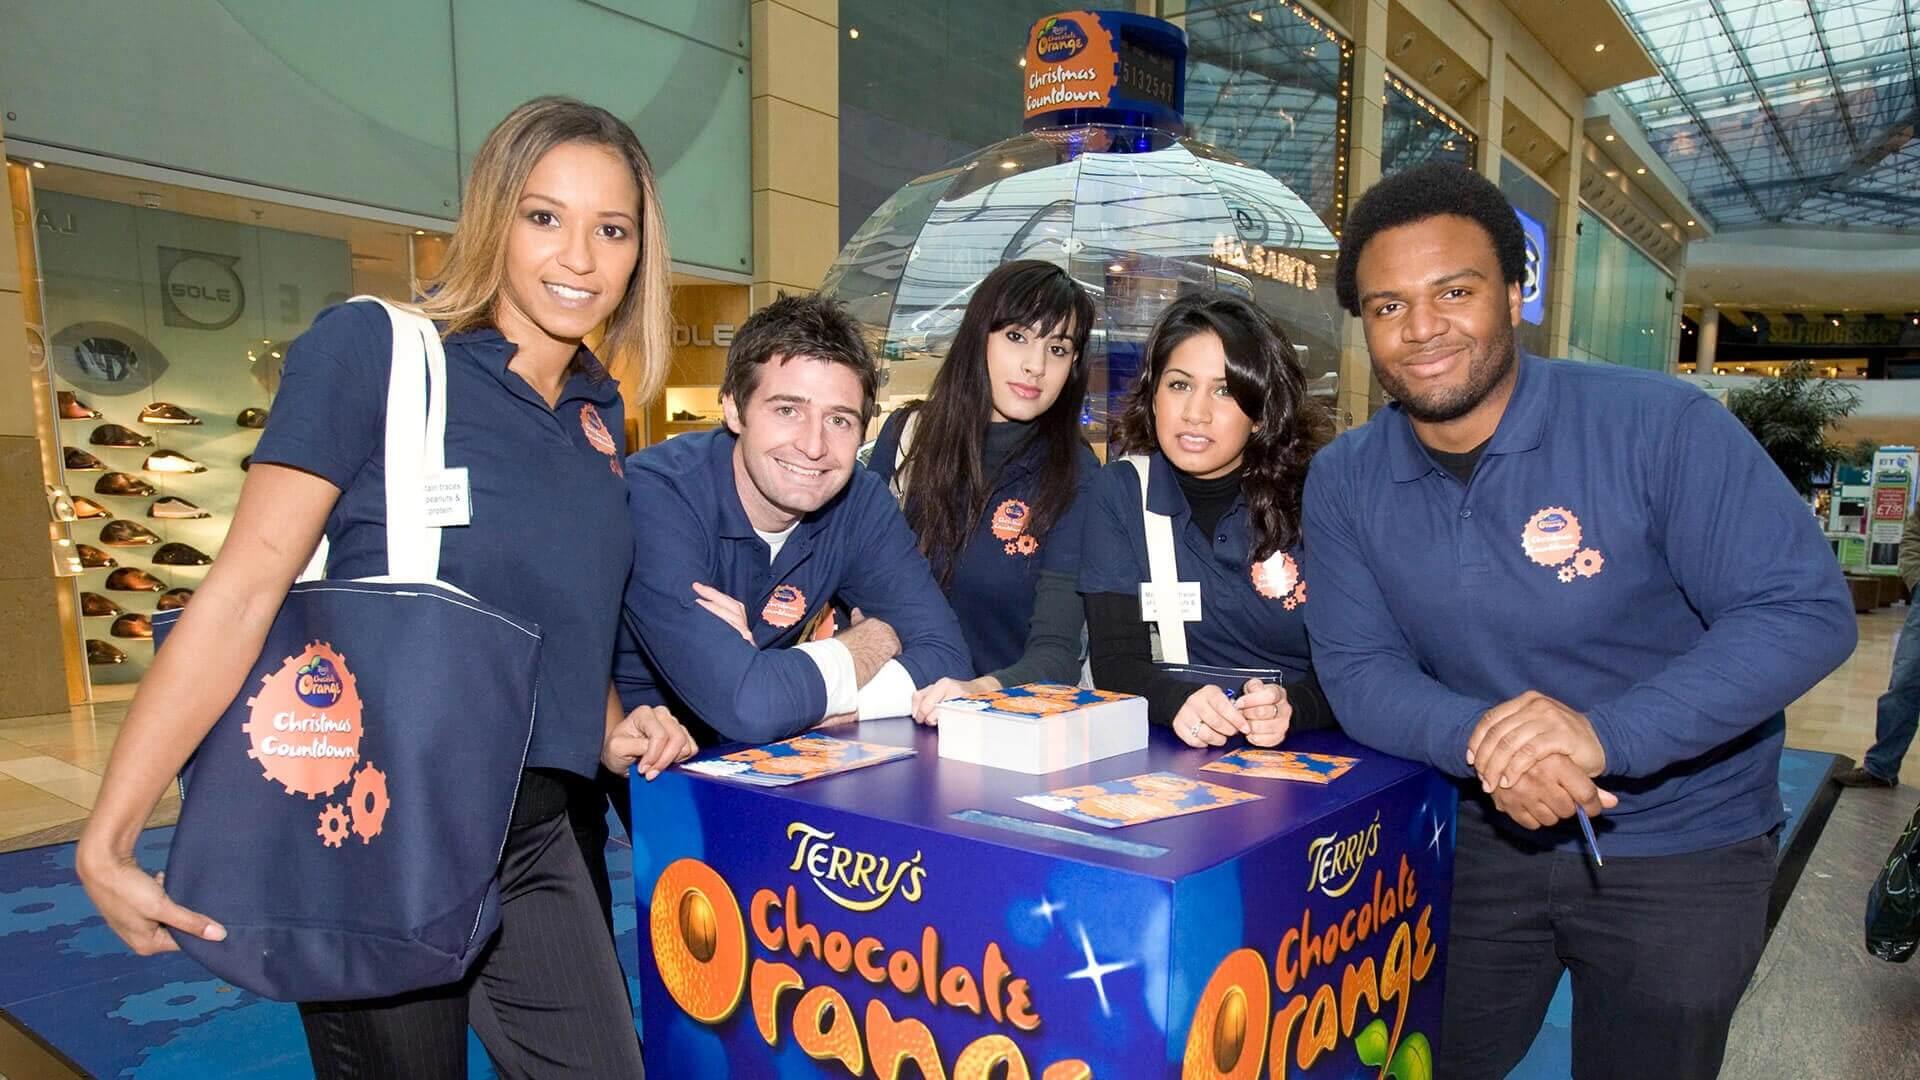 Terrys chocolate orange ambassadors